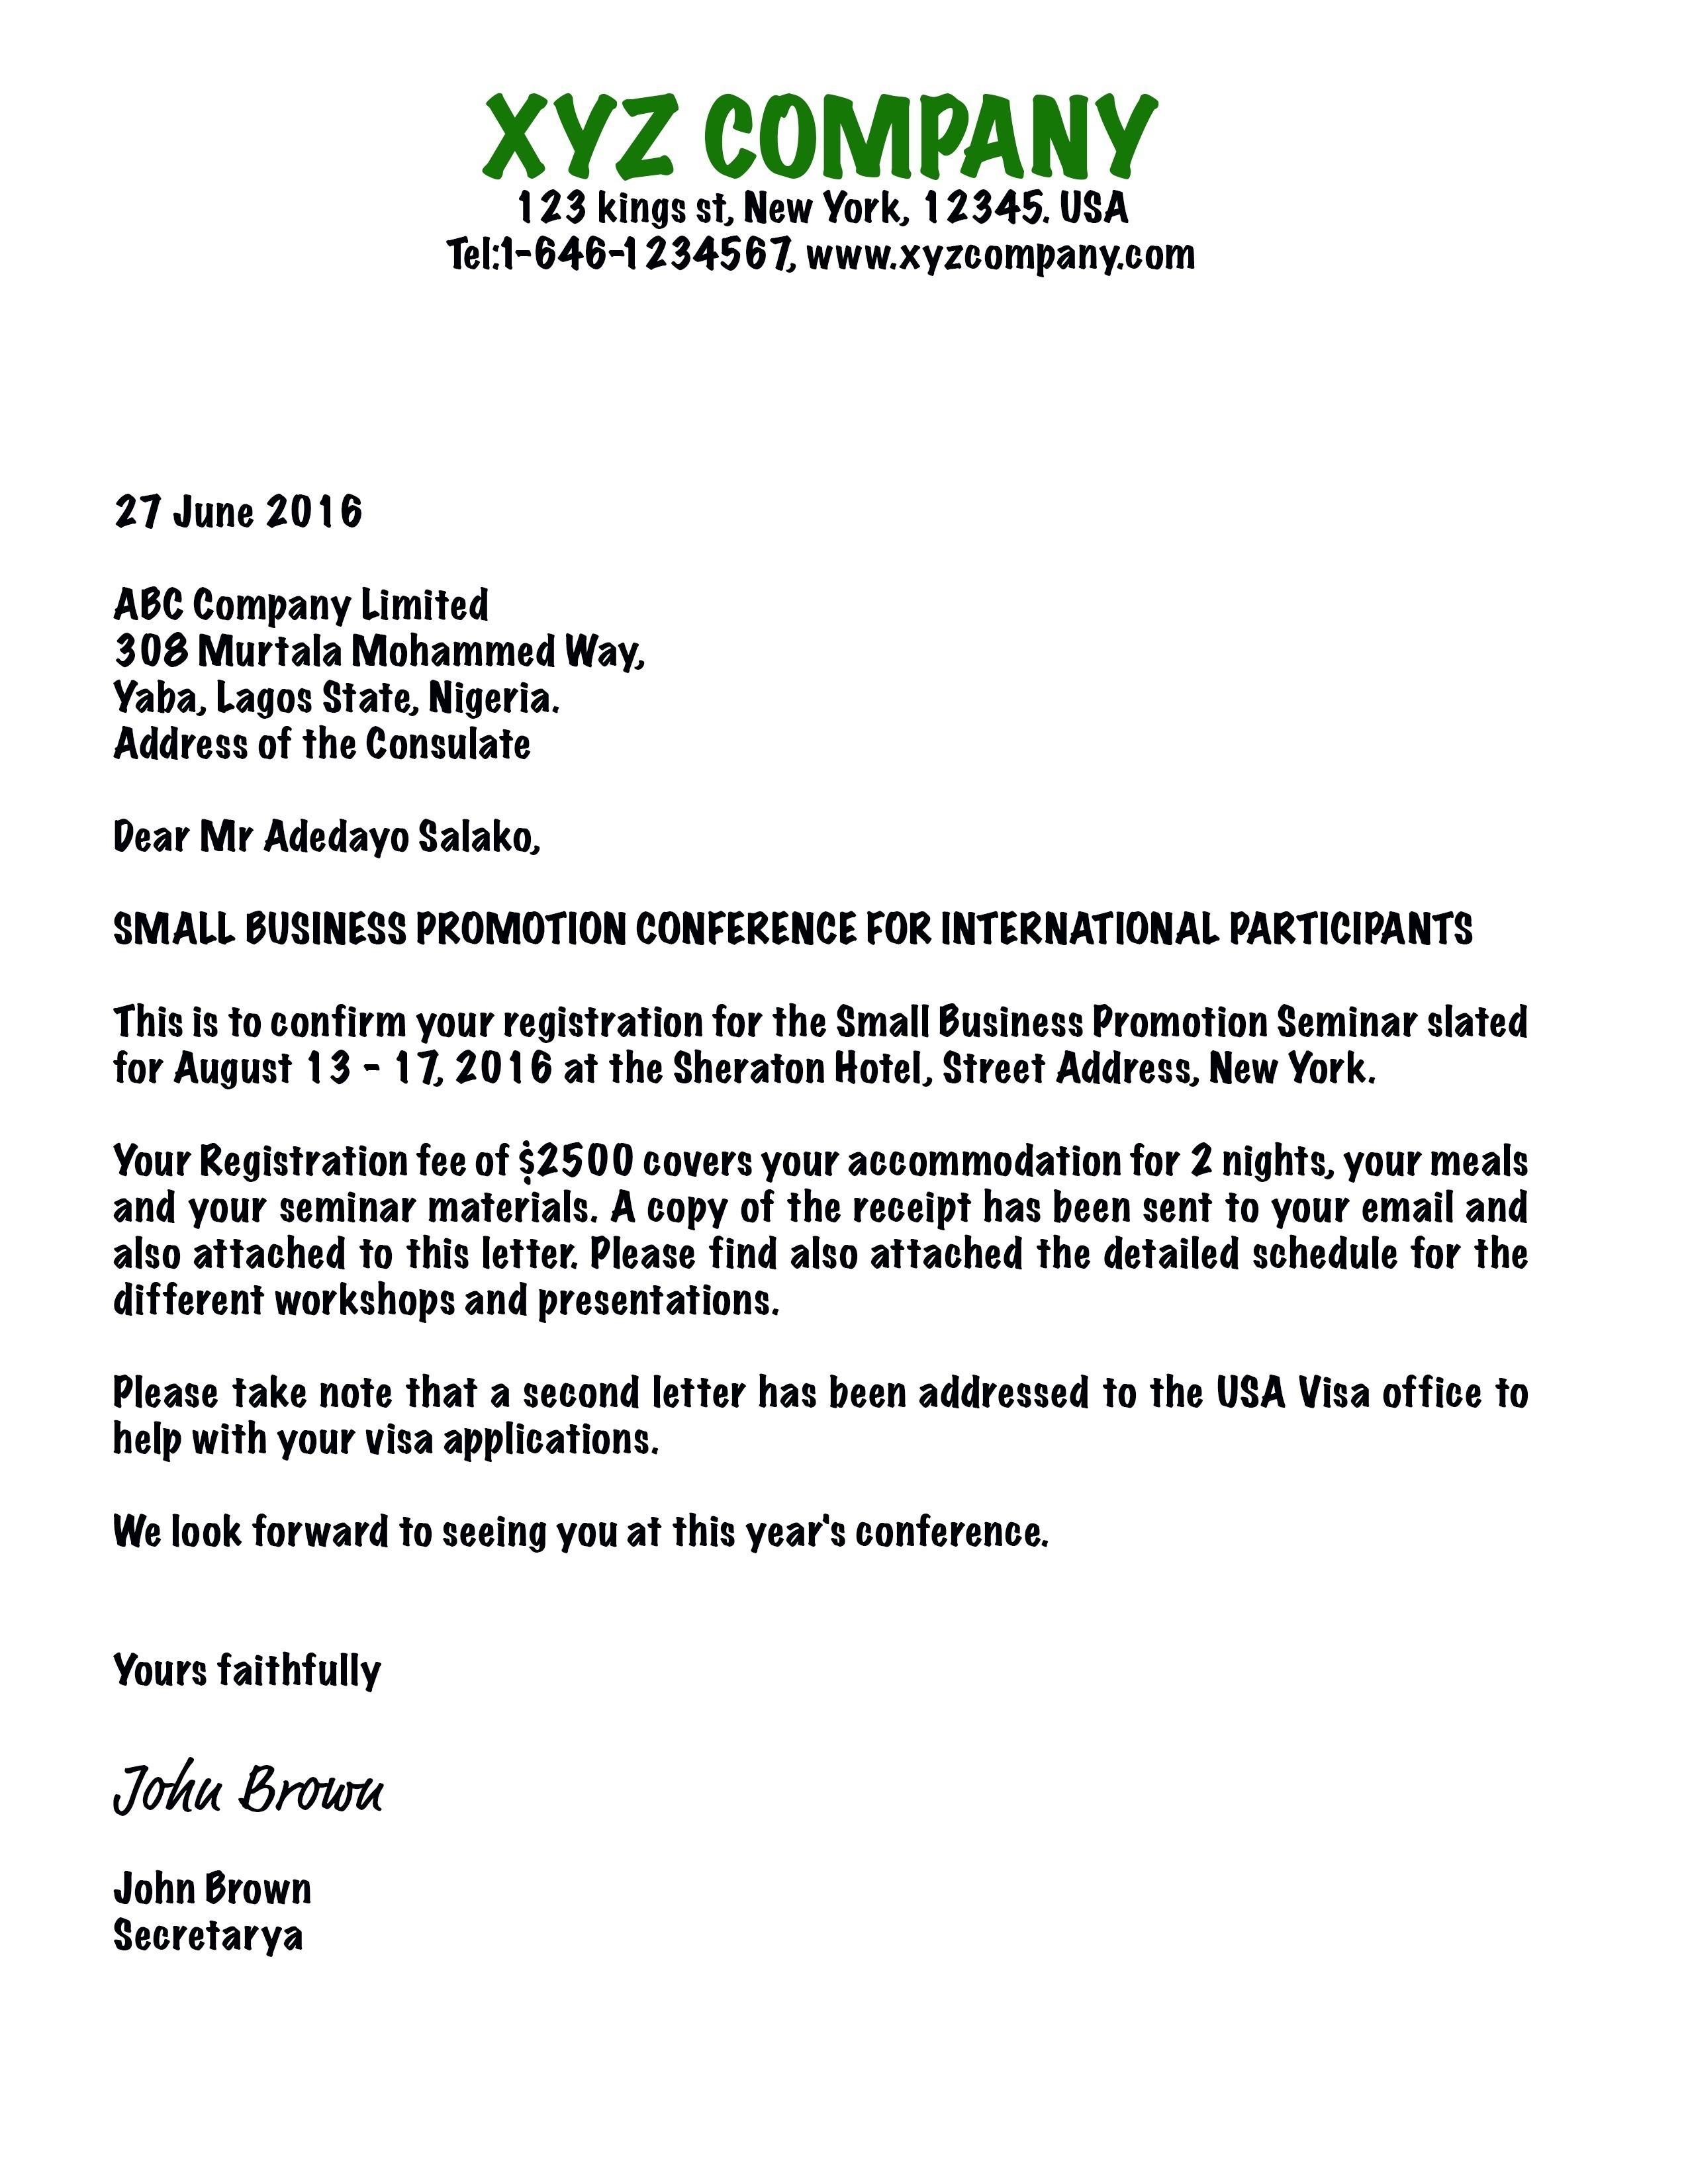 Business Invitation Letter Template - Sample Certificate Non Advancement Maternity Benefit Fresh